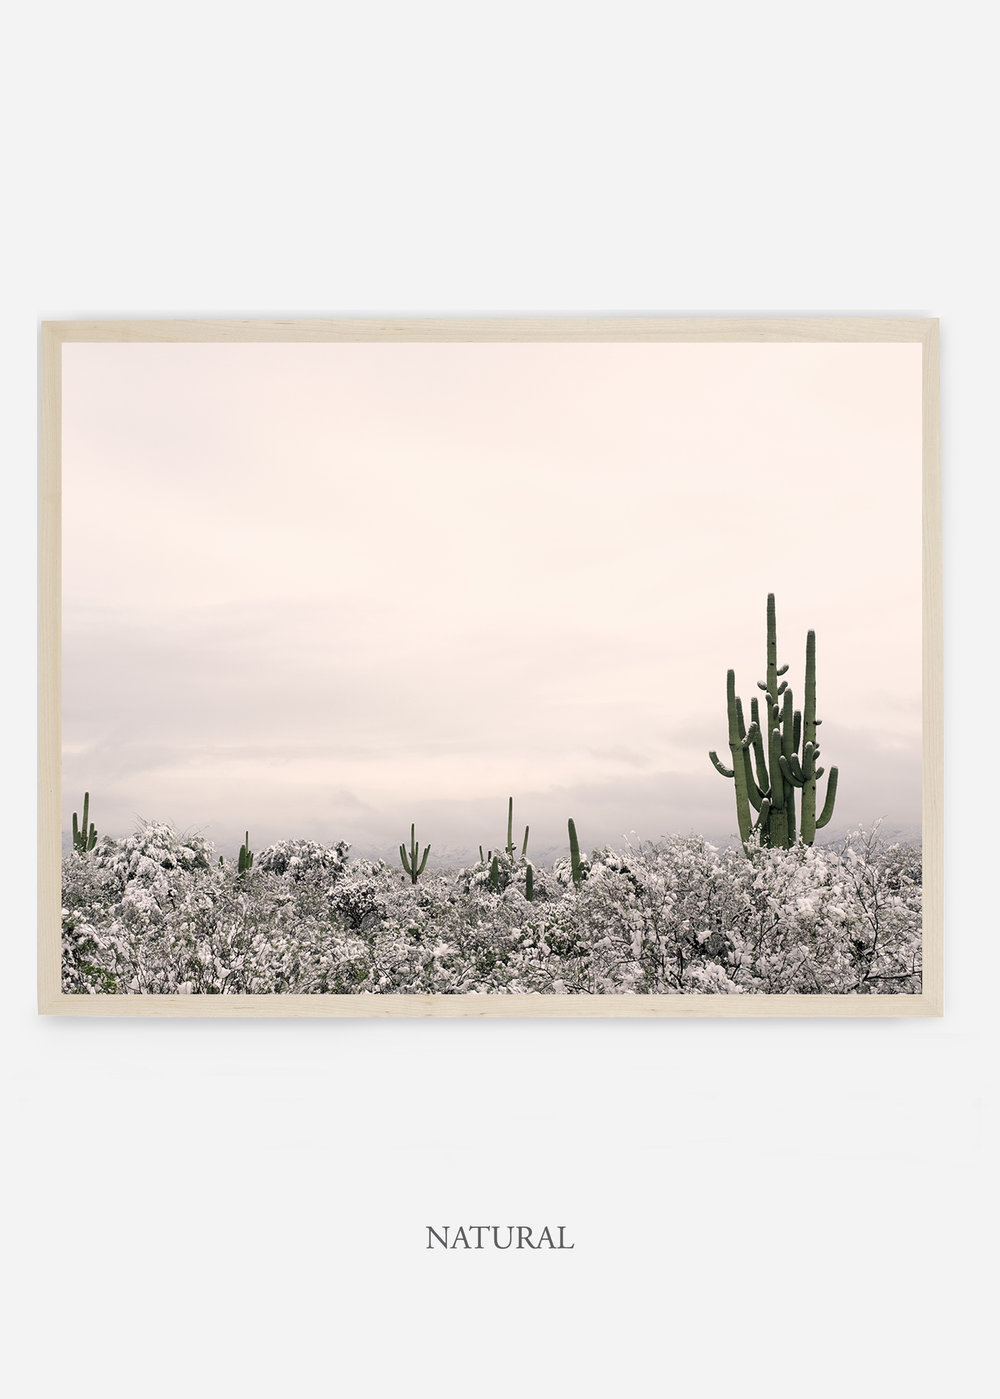 nomat_naturalframe-saguaroNo.7-wildercalifornia-art-wallart-cactusprint-homedecor-prints-arizona-botanical-artwork-interiordesign.jpg